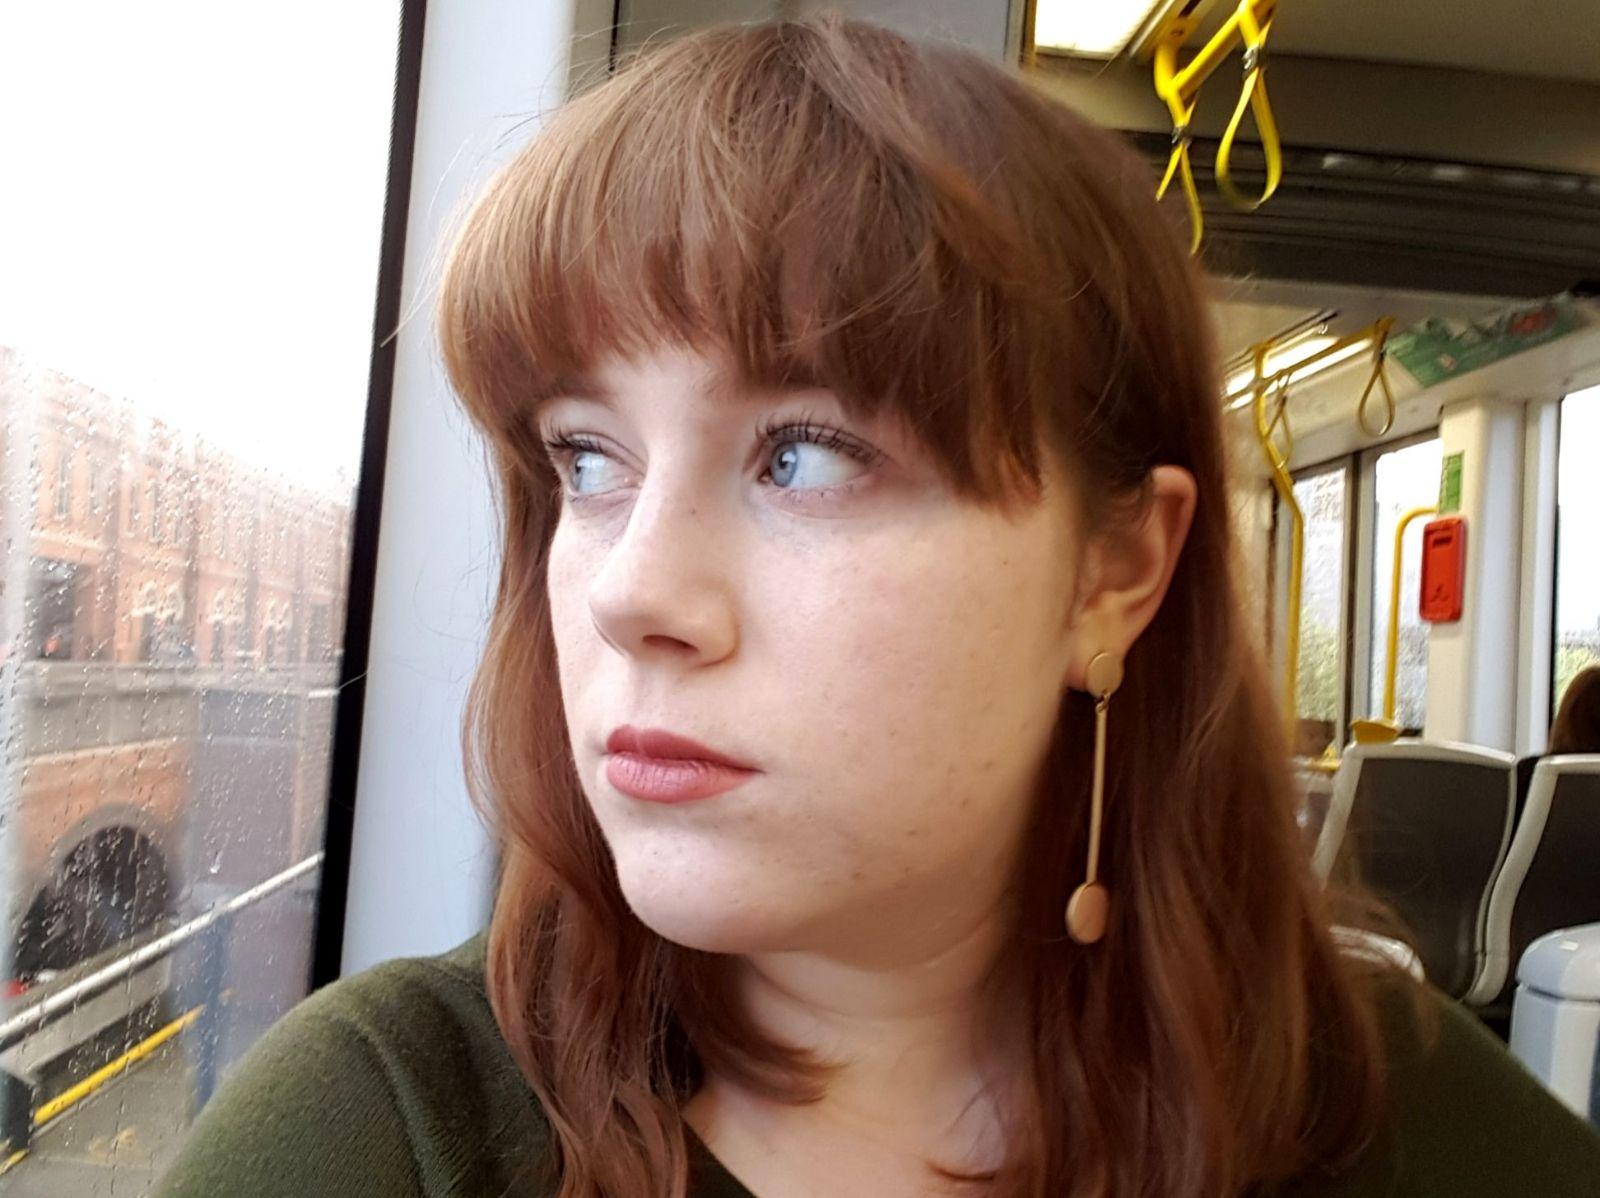 Metrolink rain